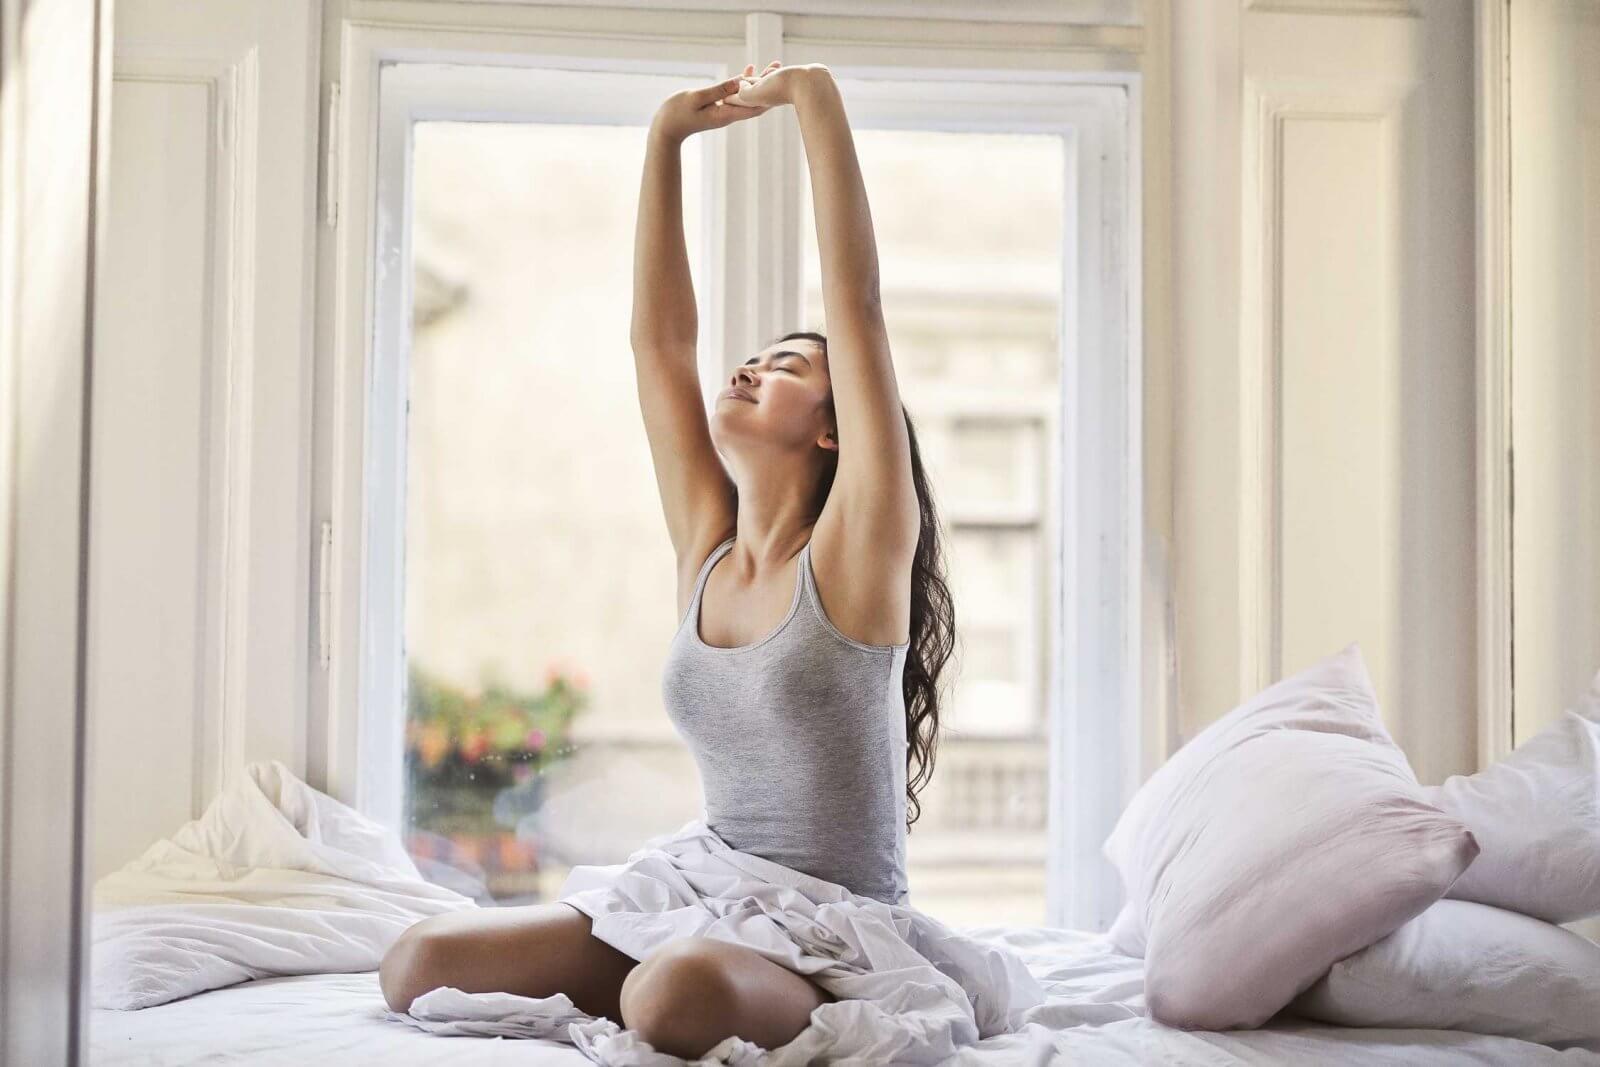 Frau macht Dehnübung im Bett